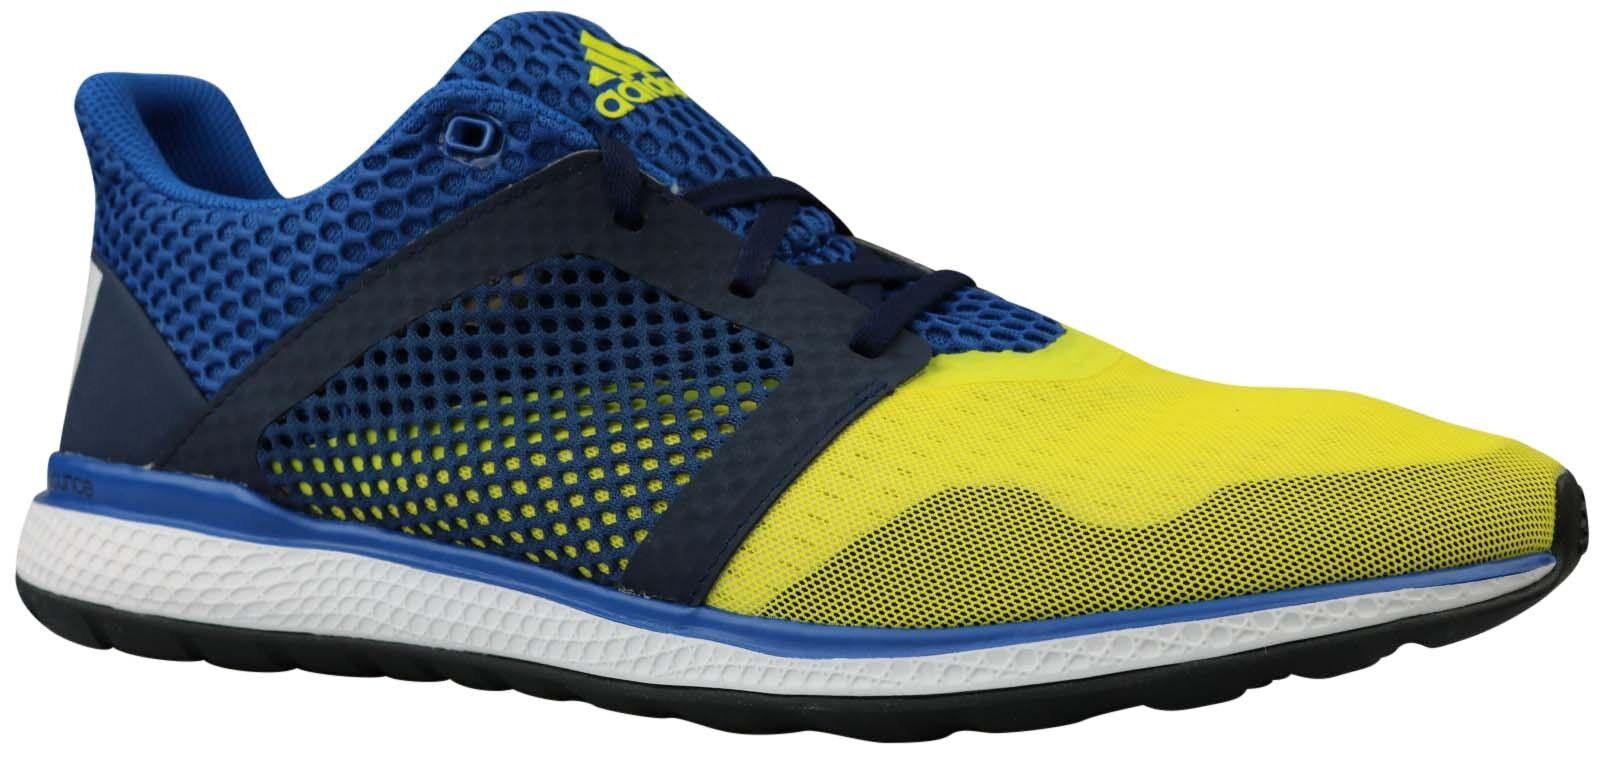 best service 9119c ded1d Adidas Energy Bounce 2 Chaussures de Course Sneaker Sneaker Sneaker Hommes  aq3157 Taille 46,5 49 50,5 Nouveau neuf dans sa bo te 4706a1